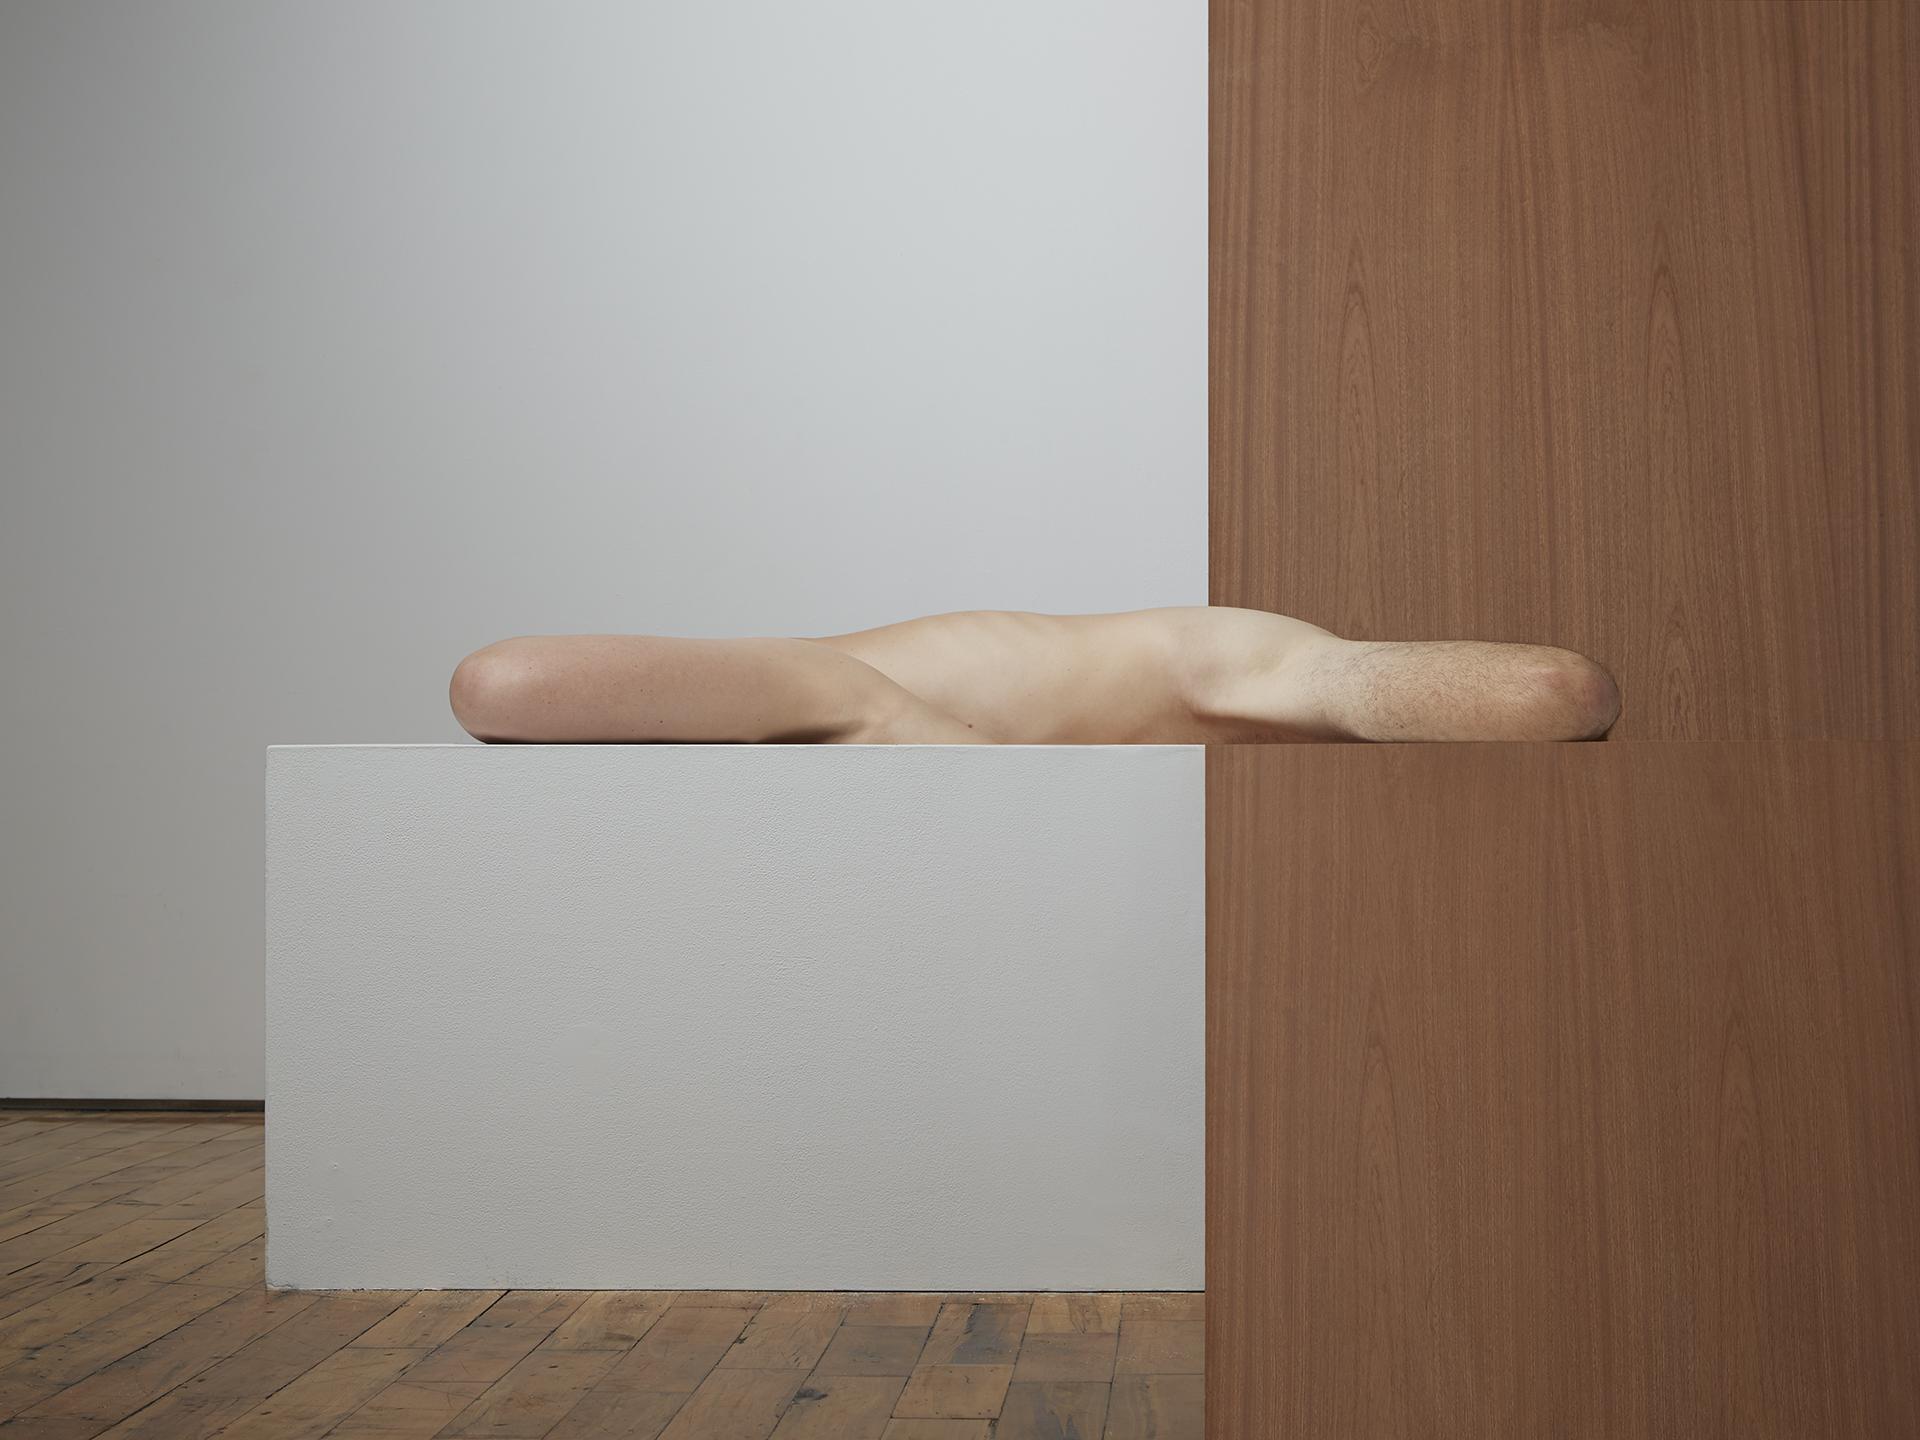 Segmented Bodies with Pedestal  2014